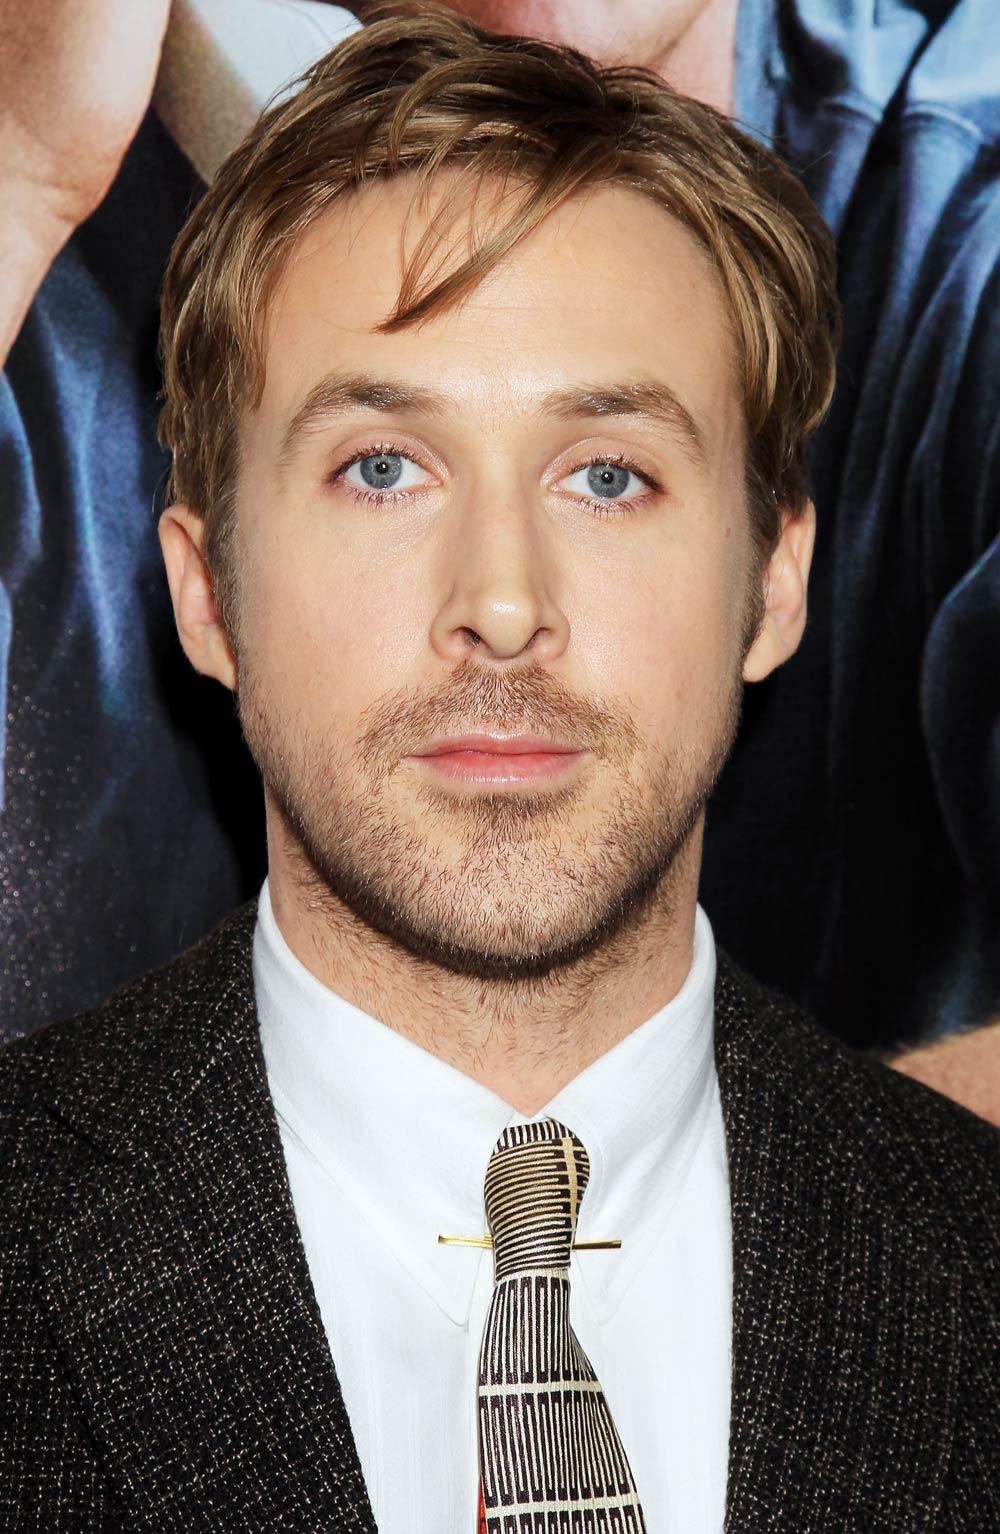 Ryan Gosling enjoys Sweet Home Alabama by Chihuahua - al.com